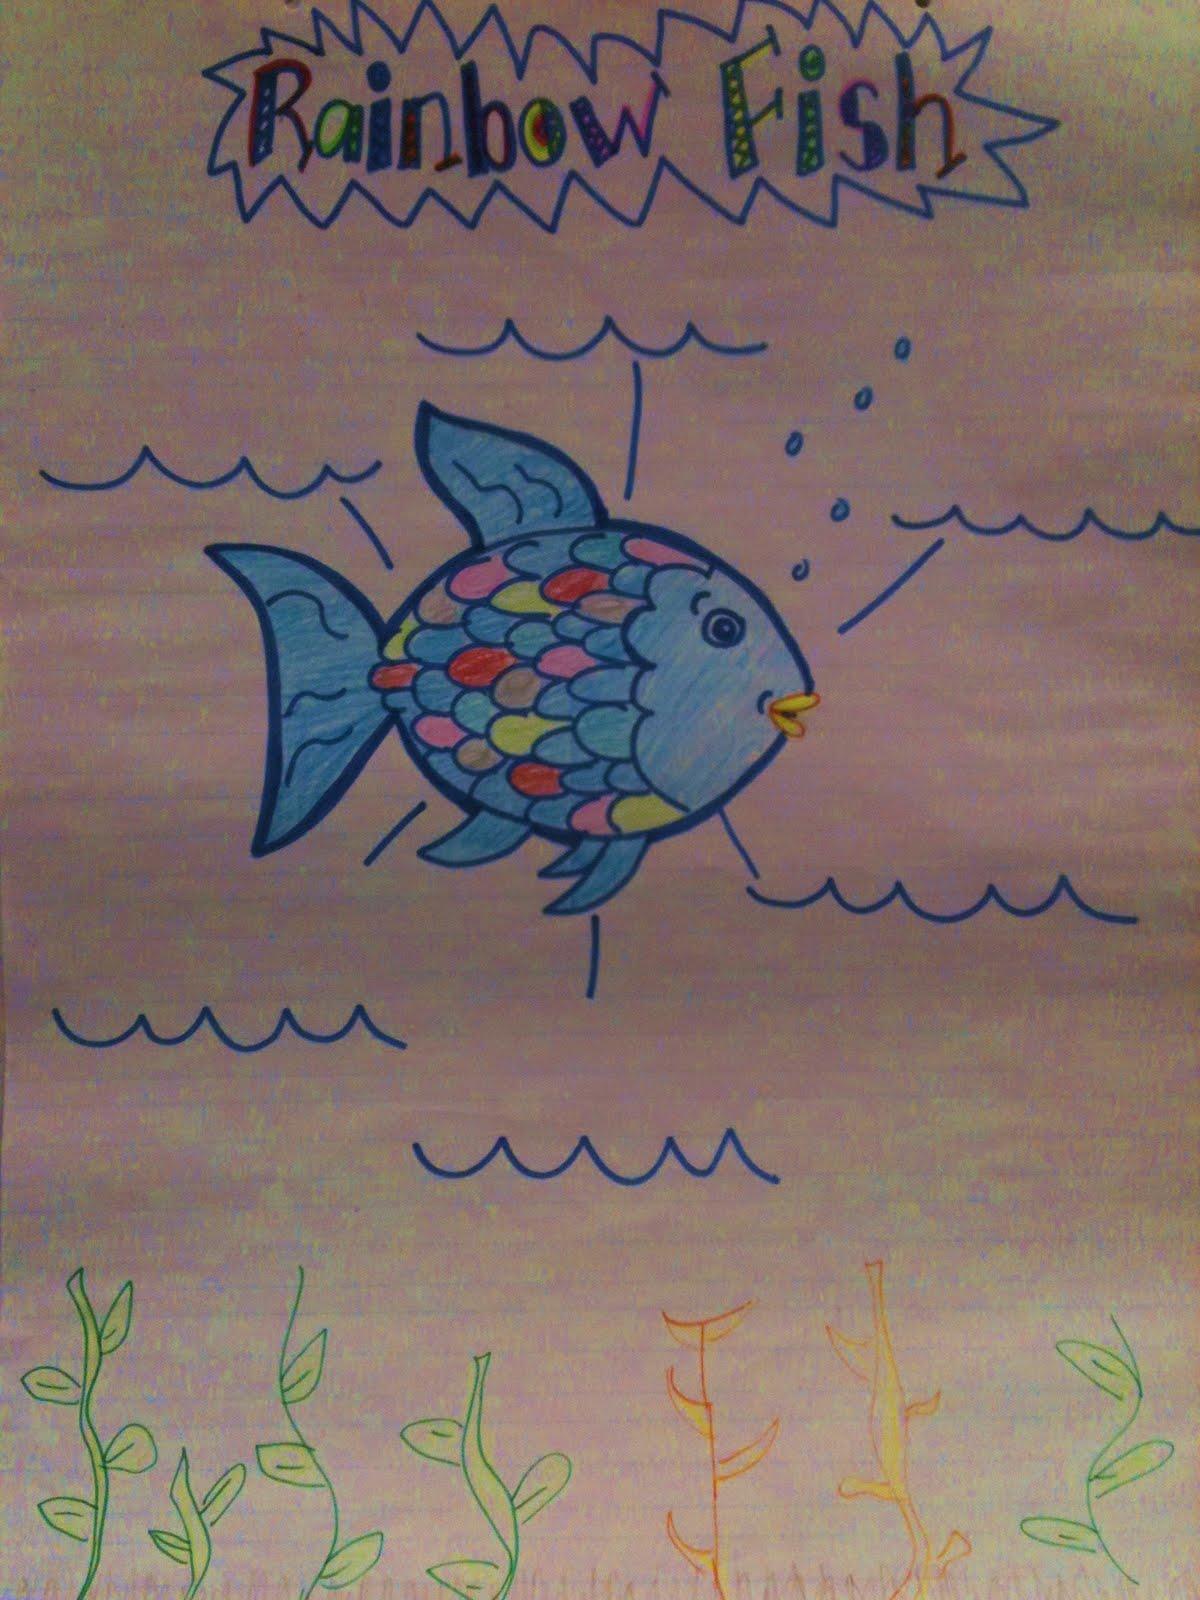 Kreative In Kinder Rainbow Fish